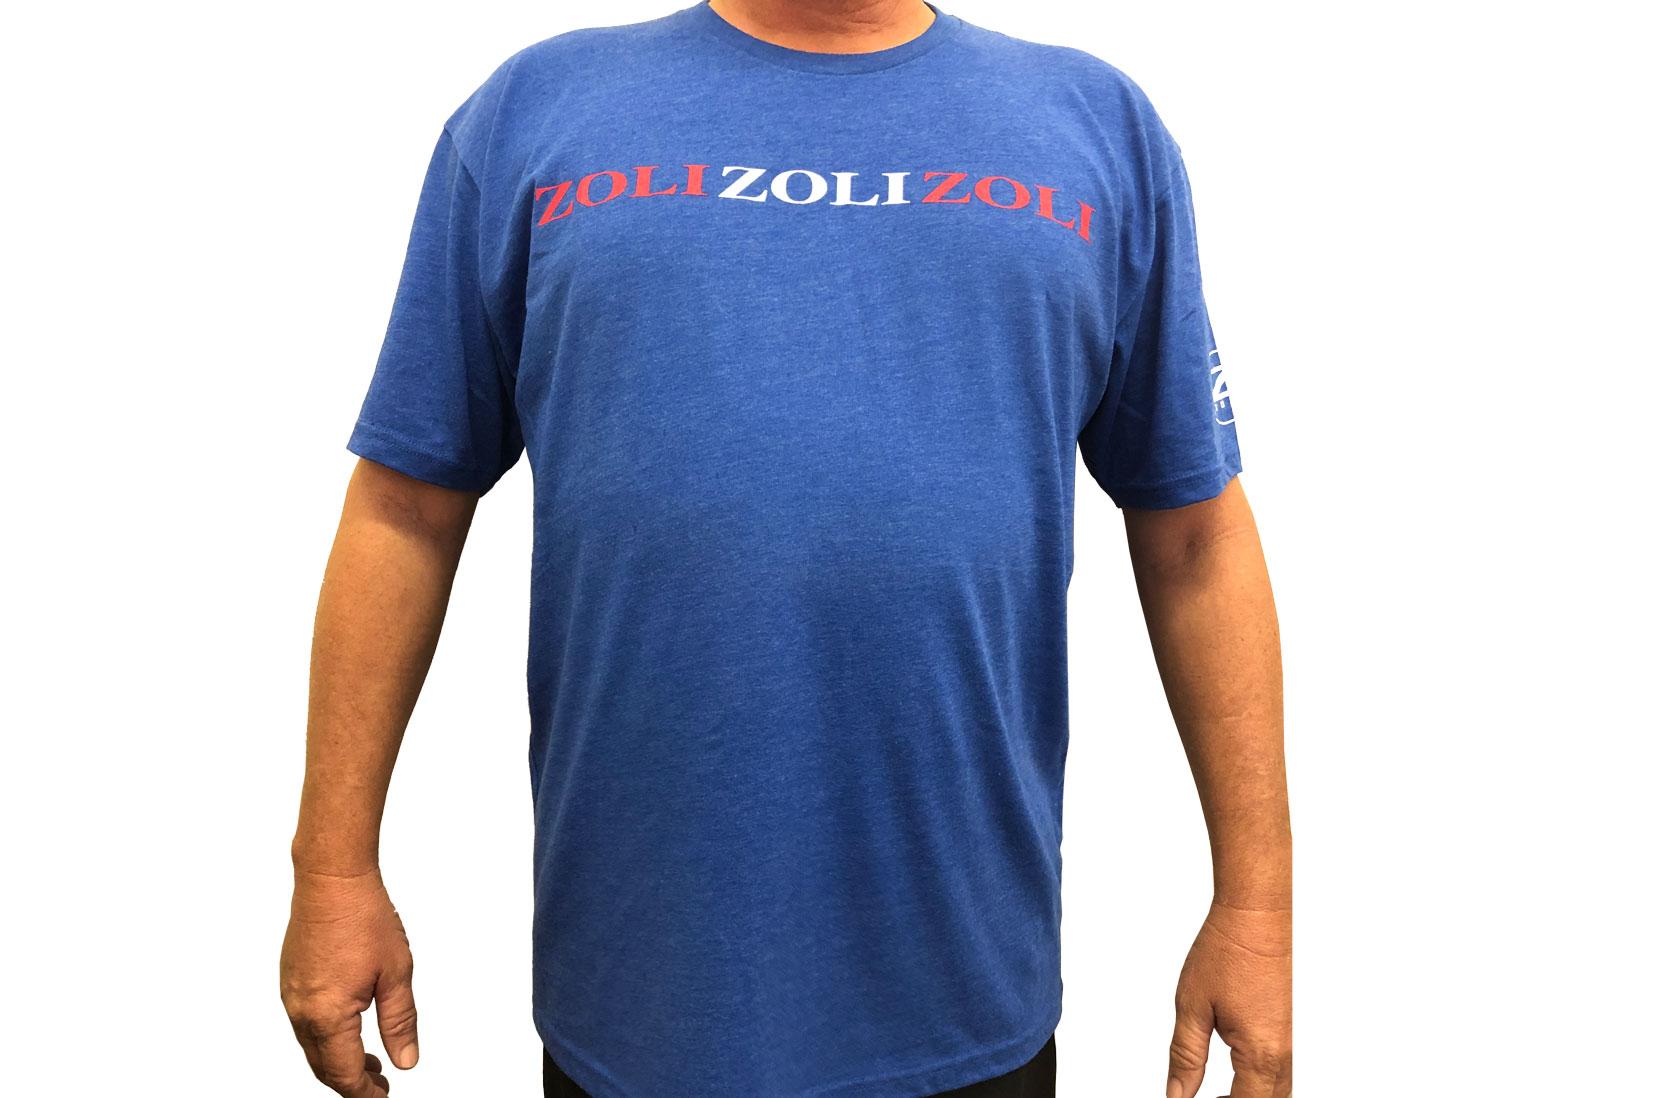 Zoli Zoli Zoli Blue Cotton Shirt